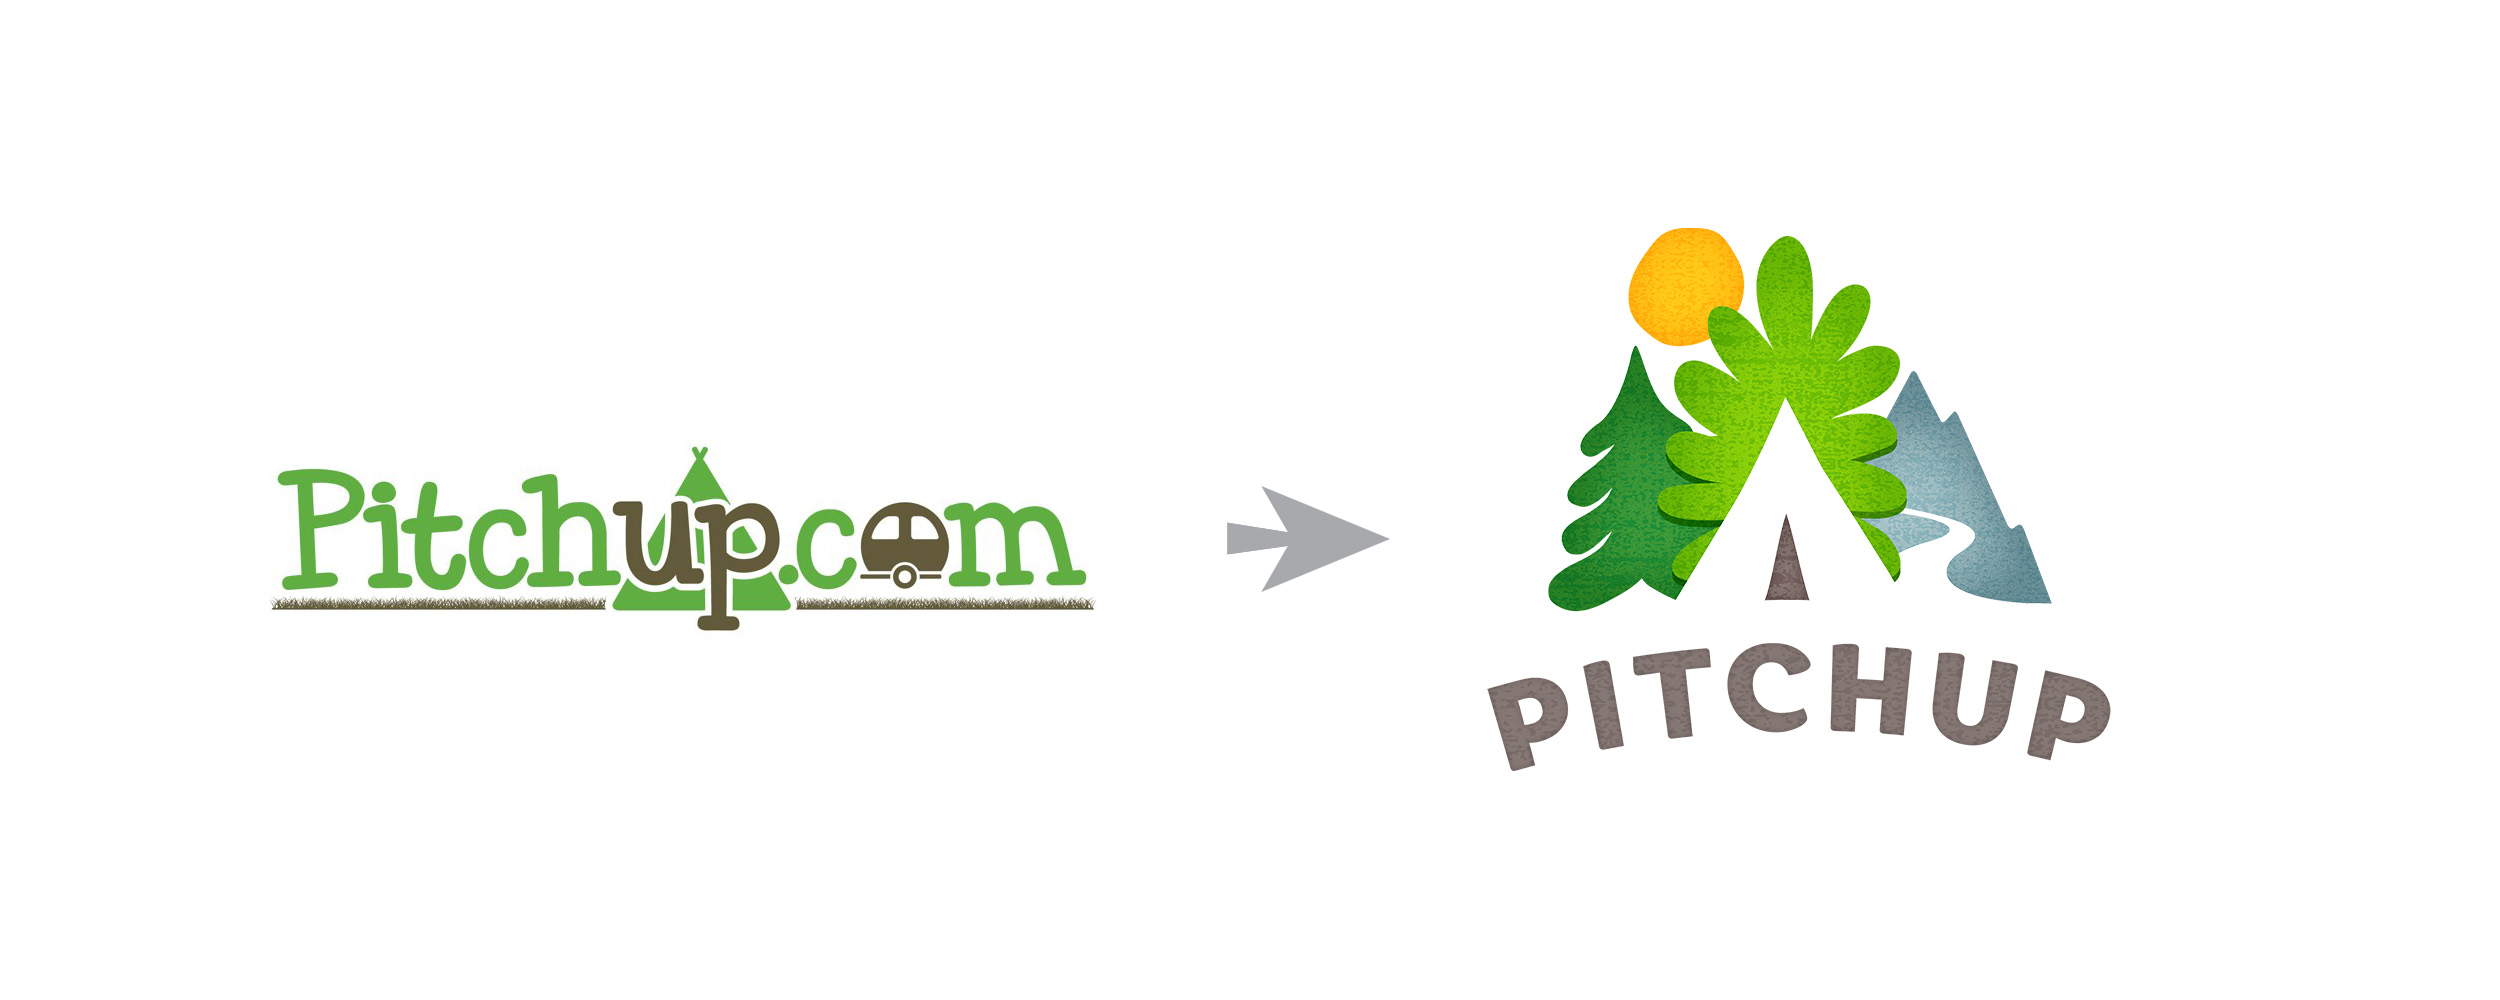 Pitchup logo evo.jpg